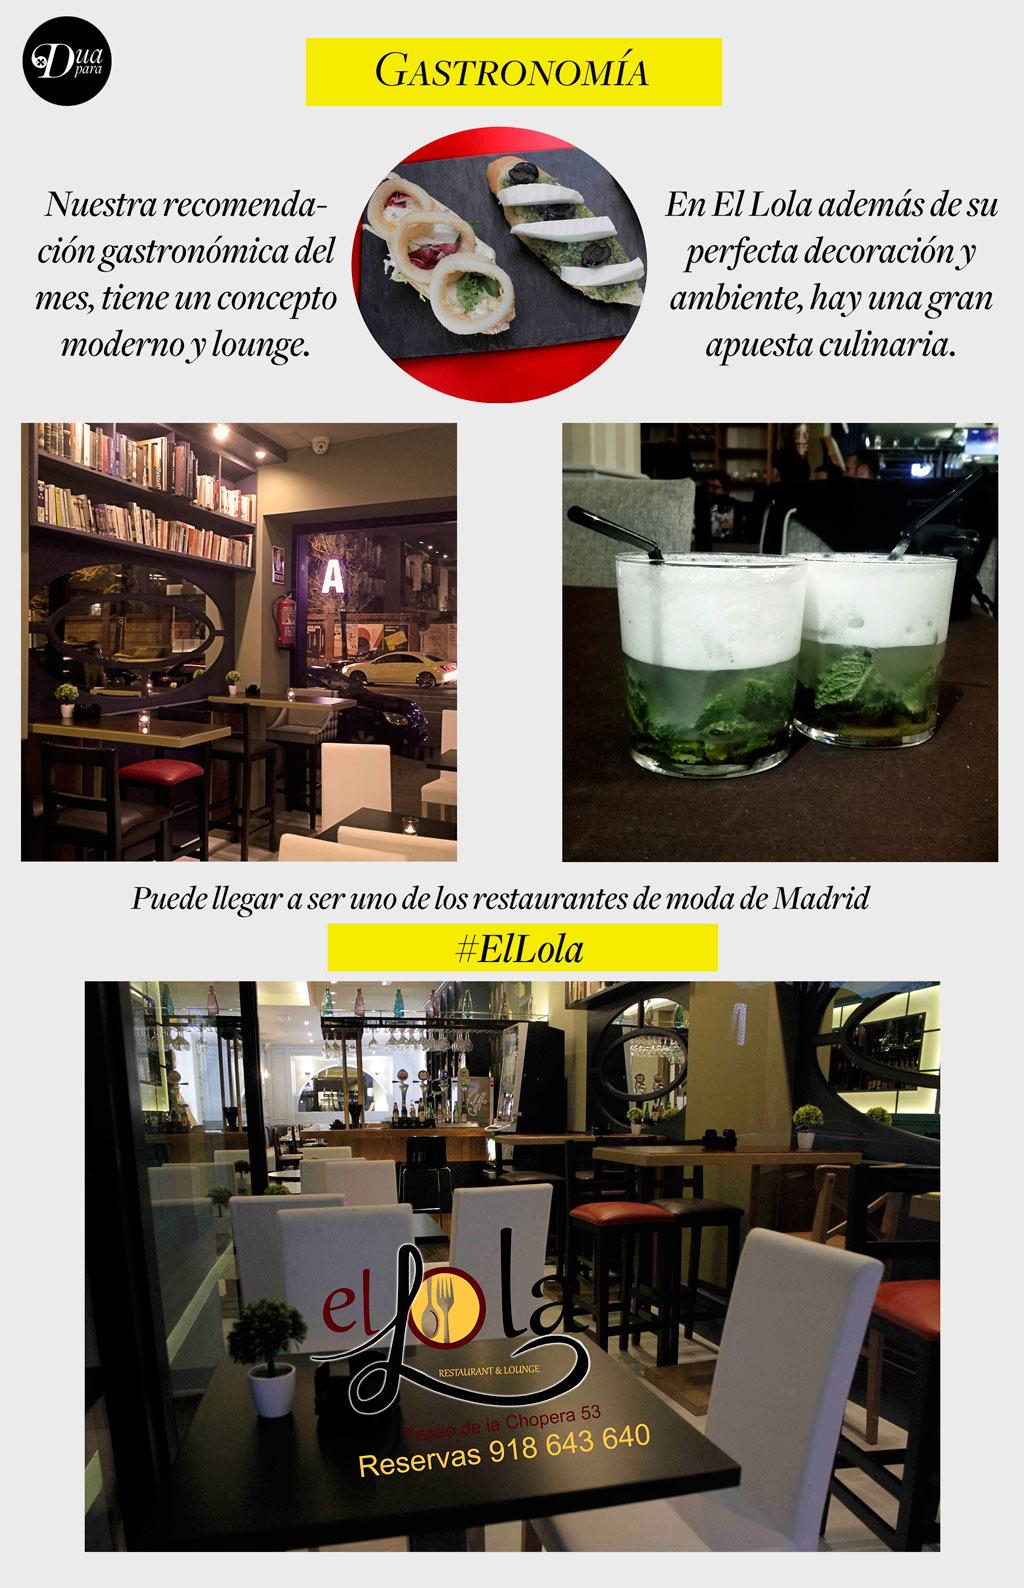 ElLolaRestauranteMadrid